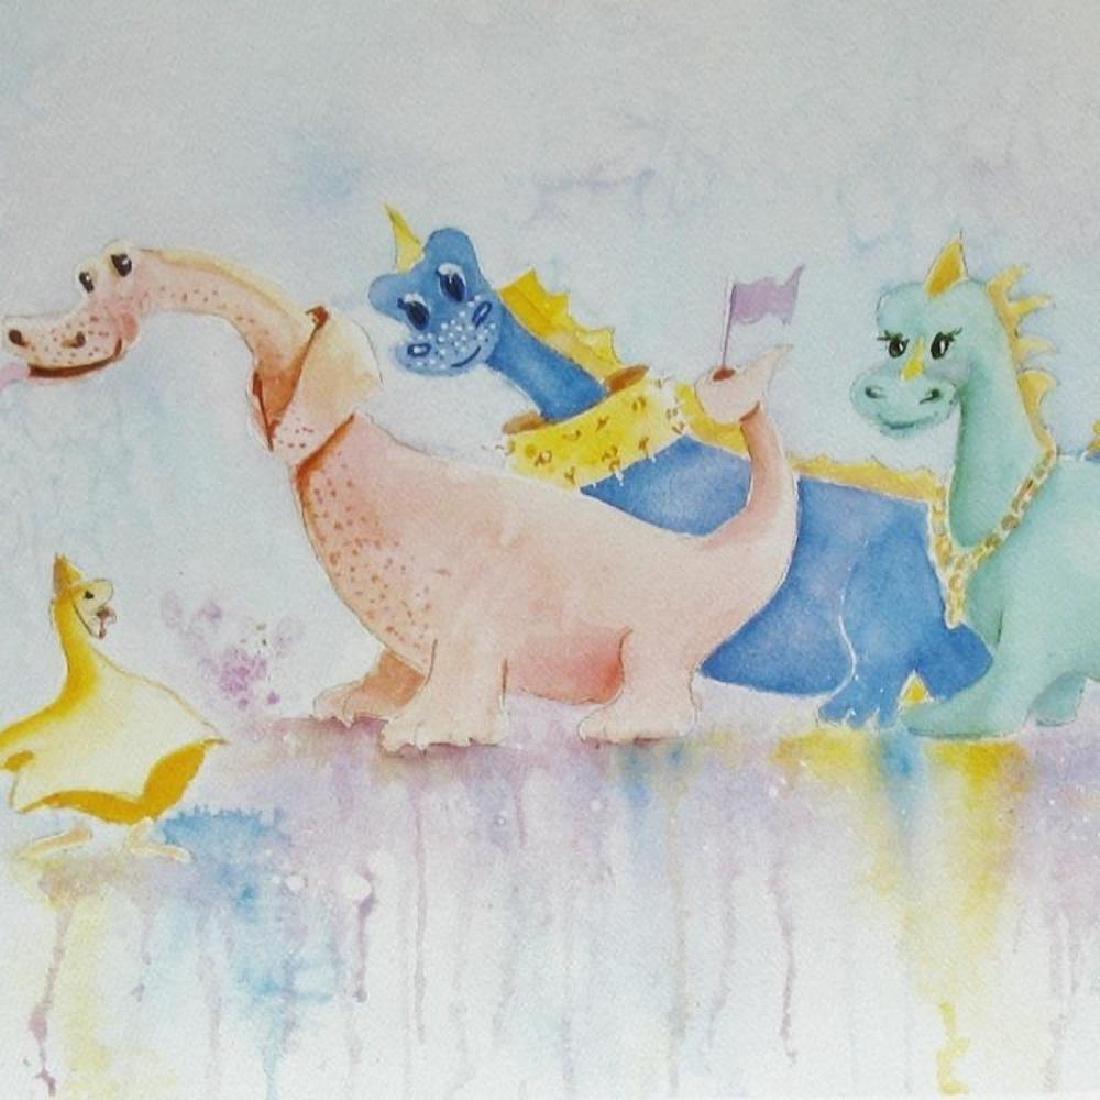 Fun Dinasaur Dragon Whimsical Naïve Colorful Signed - 3